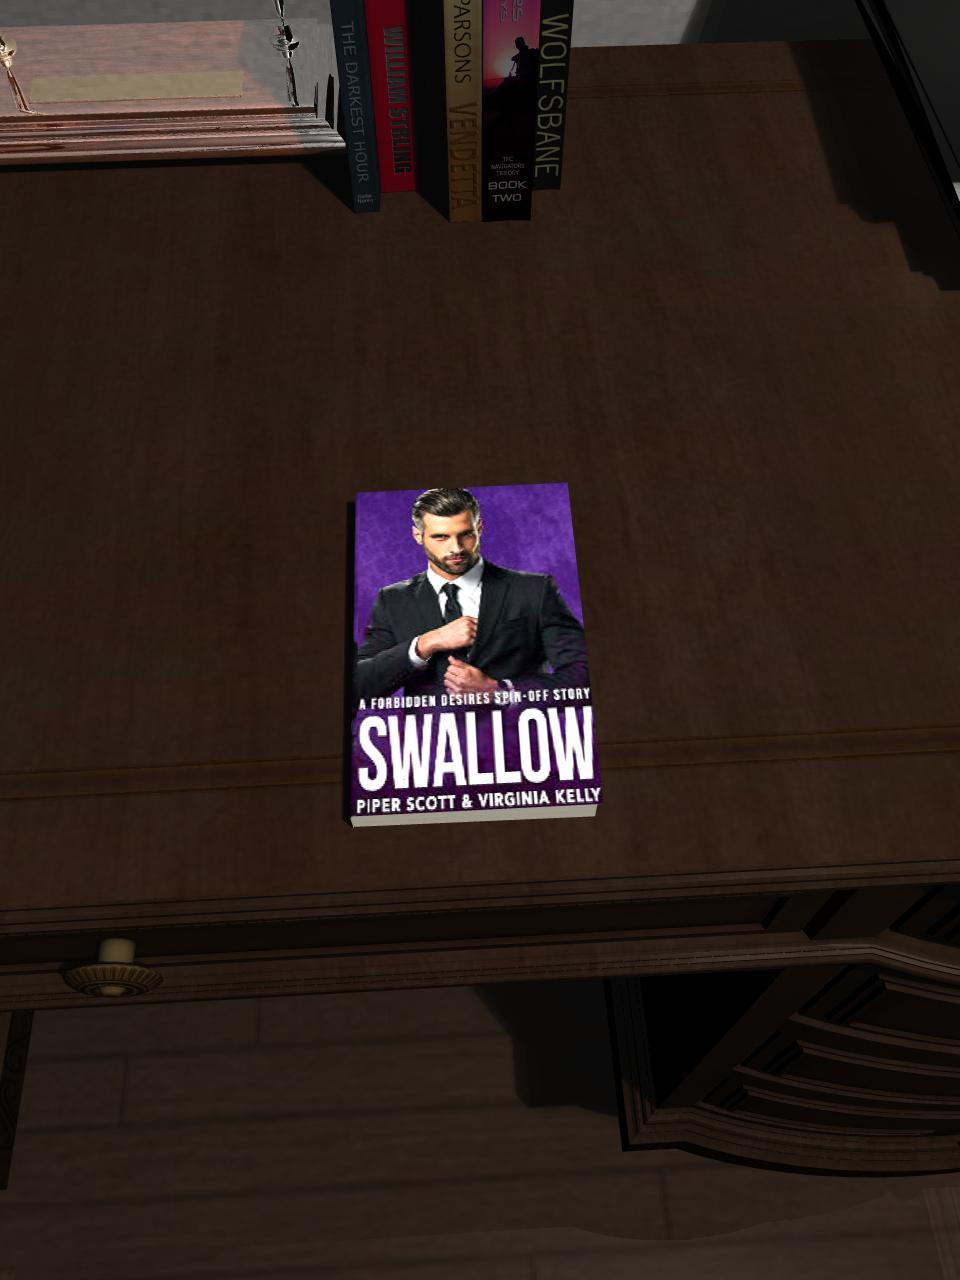 Swallow: A Forbidden Desires Spin-OffStory